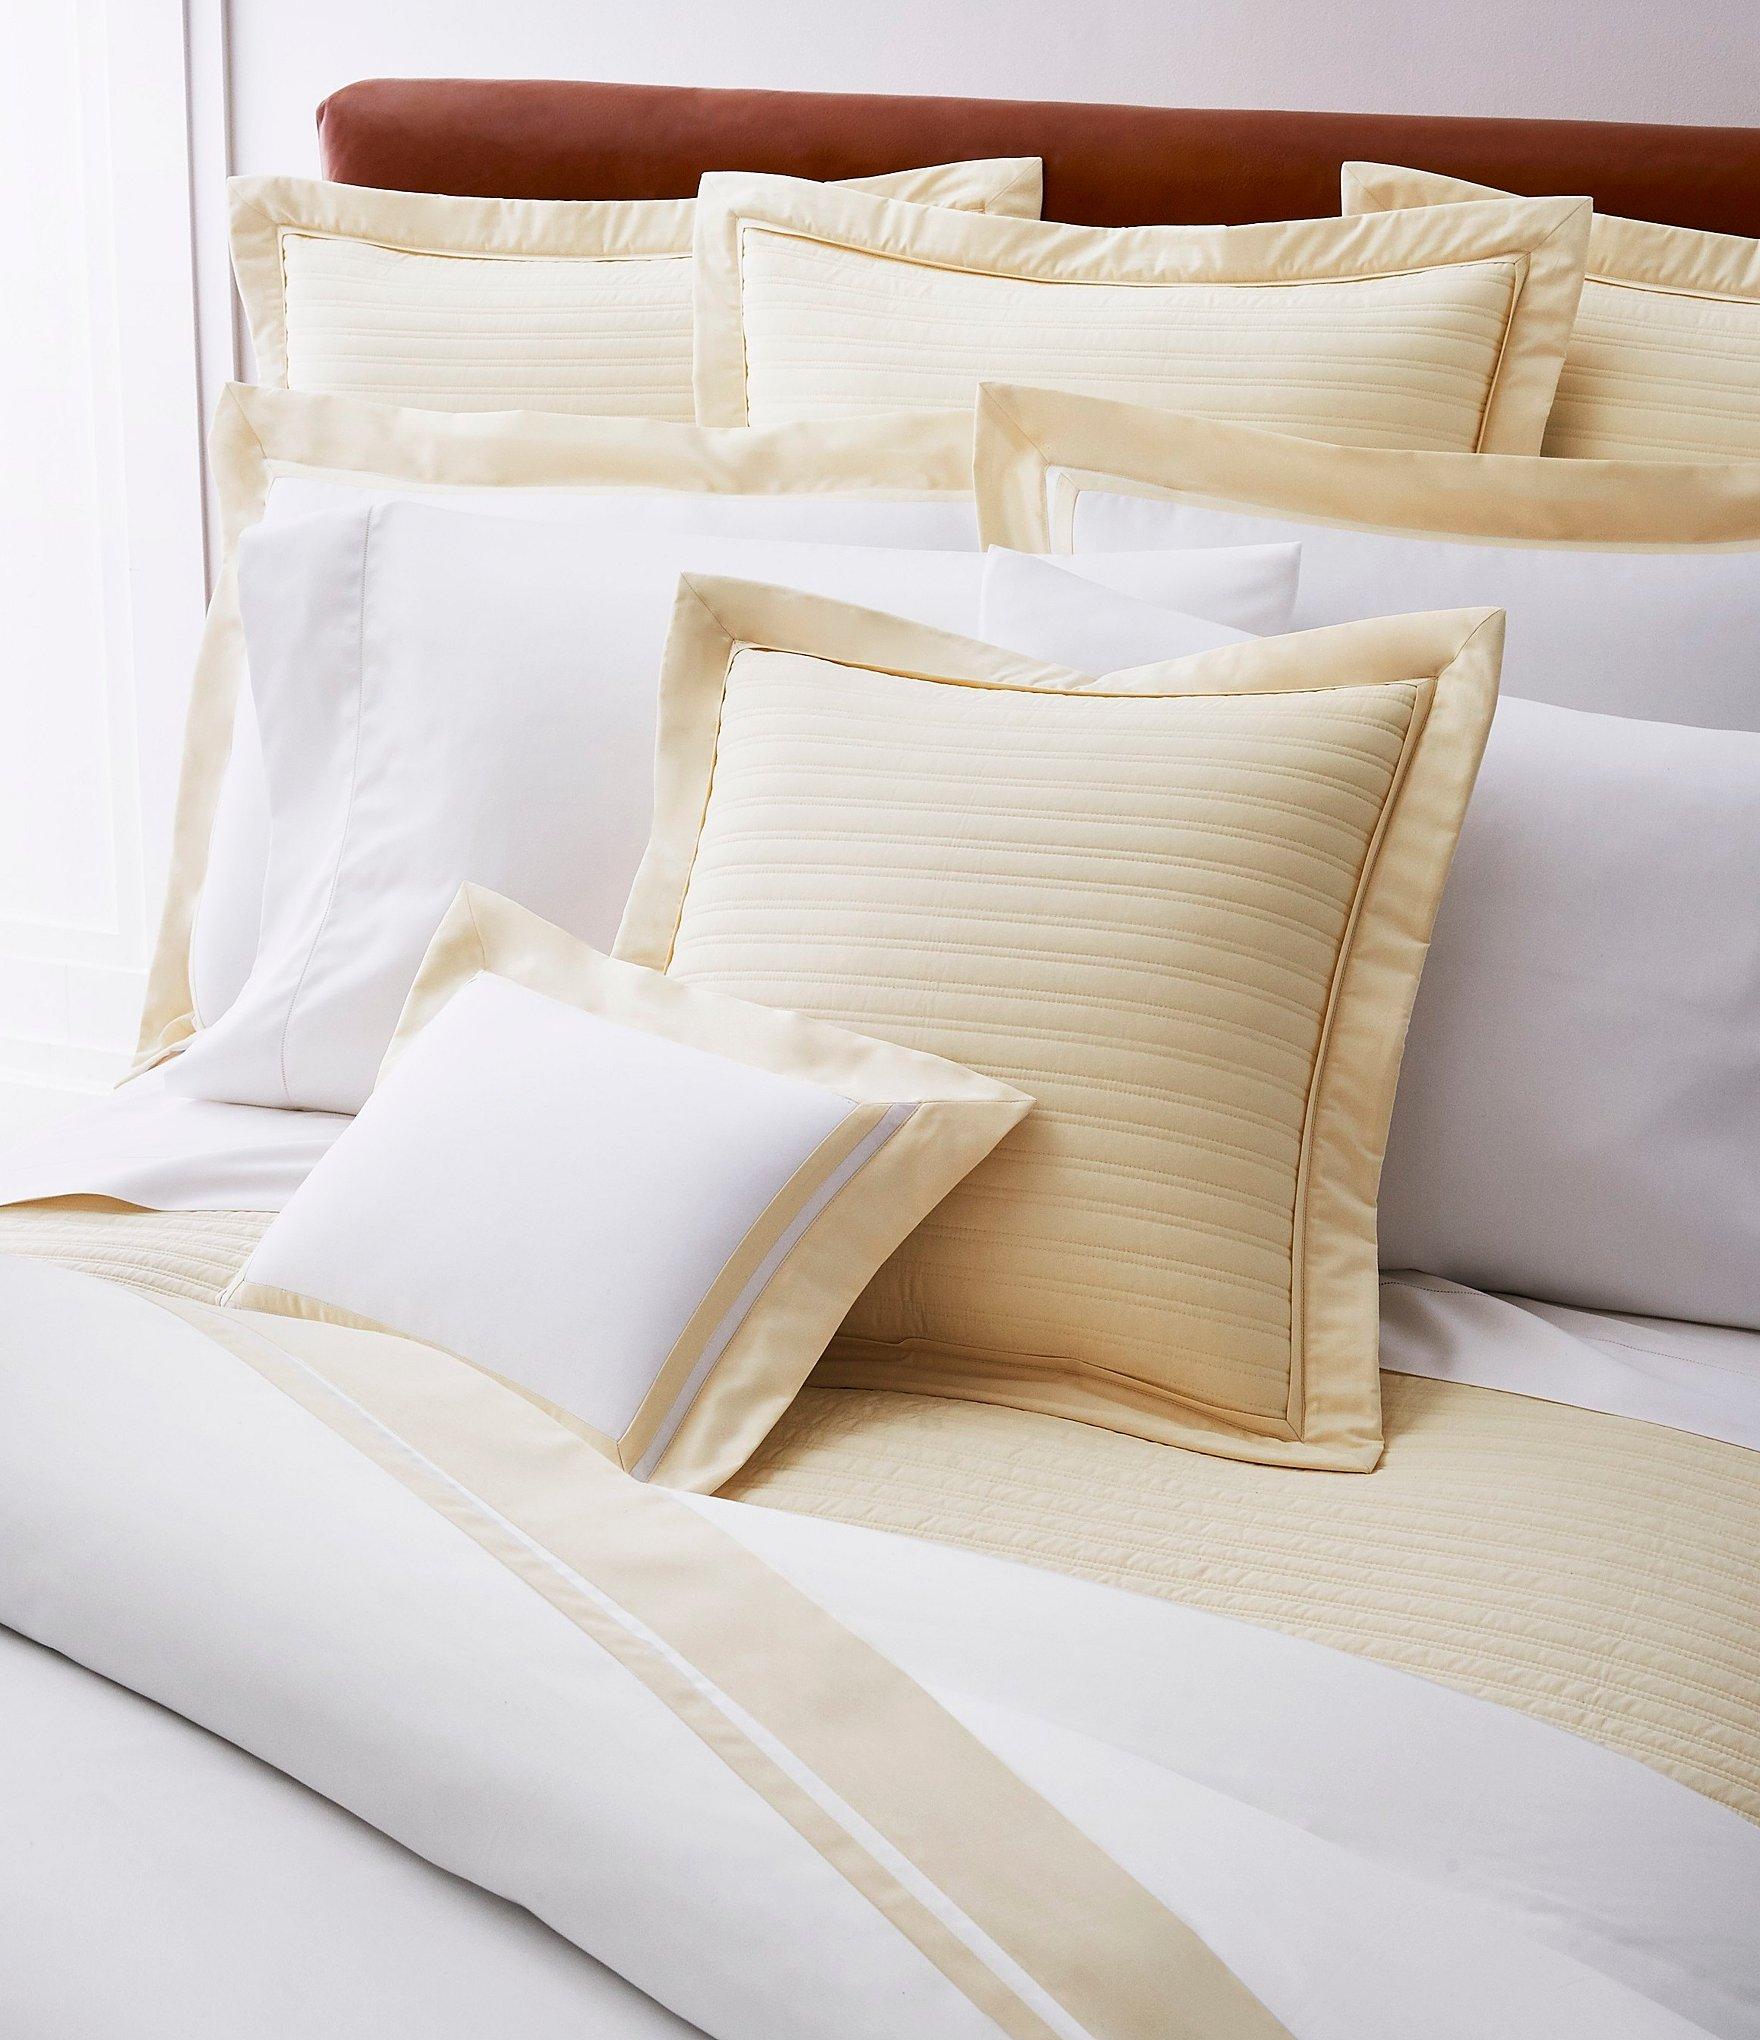 Ralph lauren home bedding - Ralph Lauren Home Bedding 18